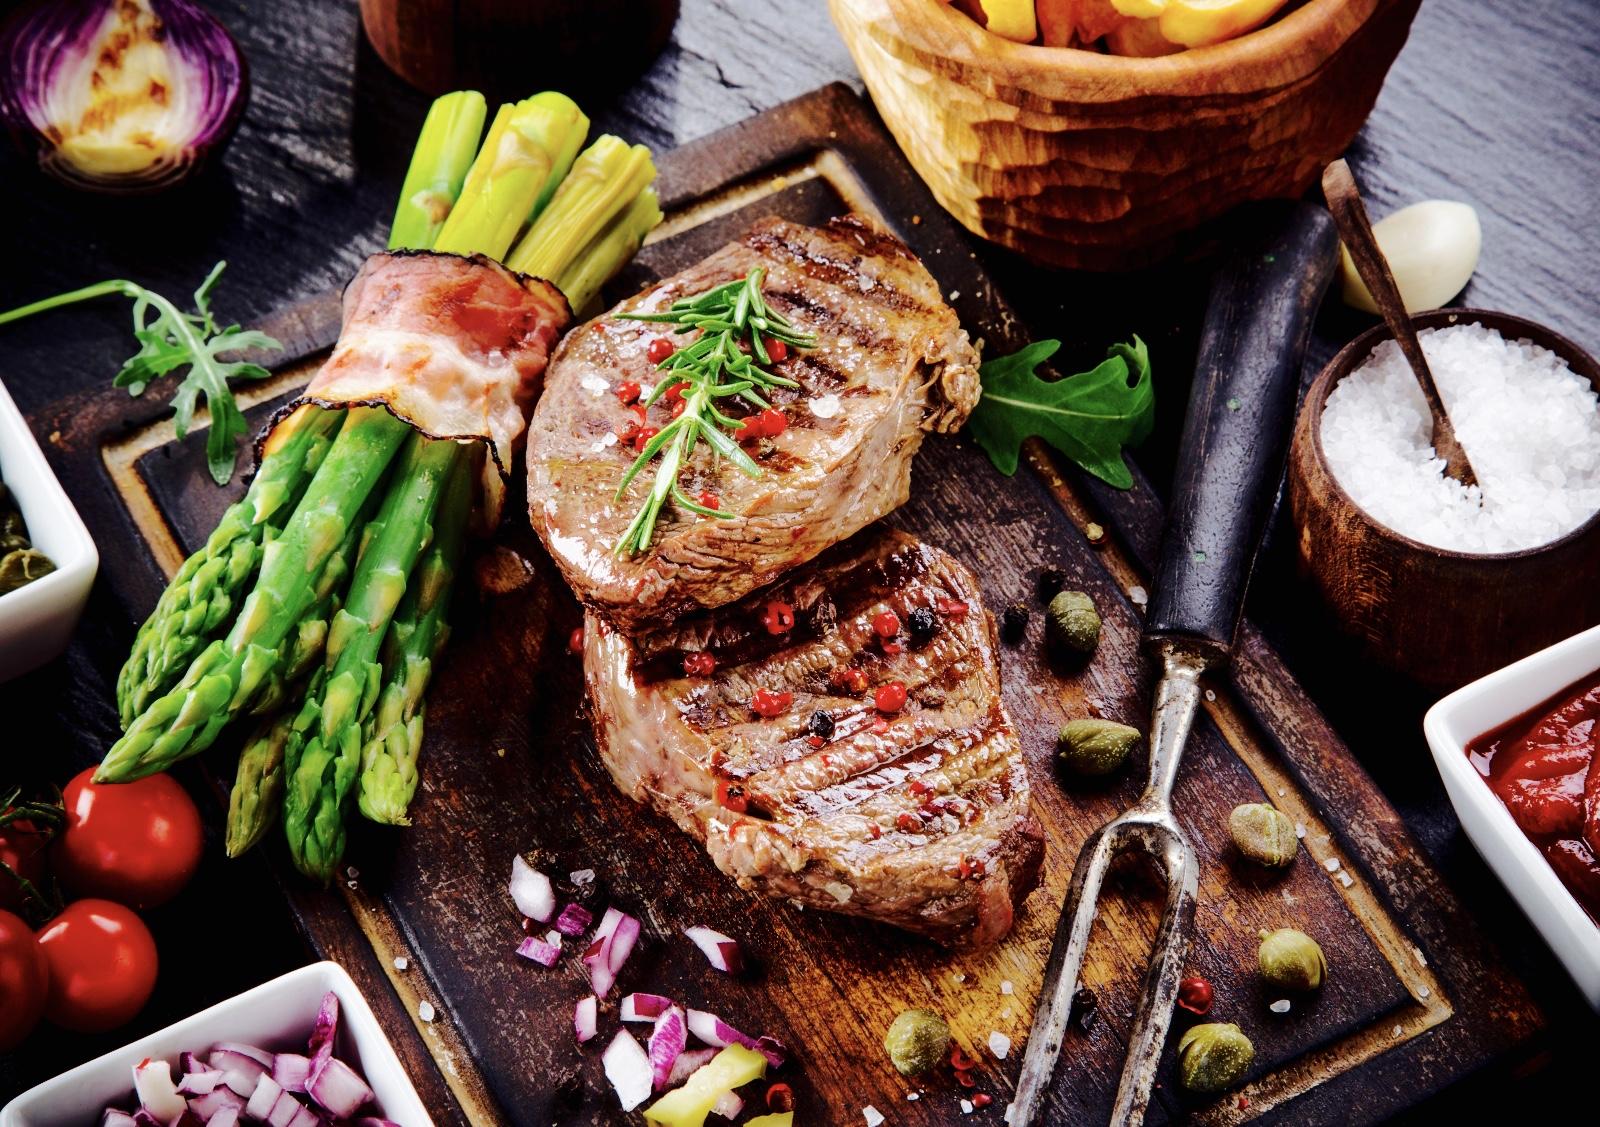 club-beef-steak-pepper-sauce-and-grilled-vegetables_1.jpg